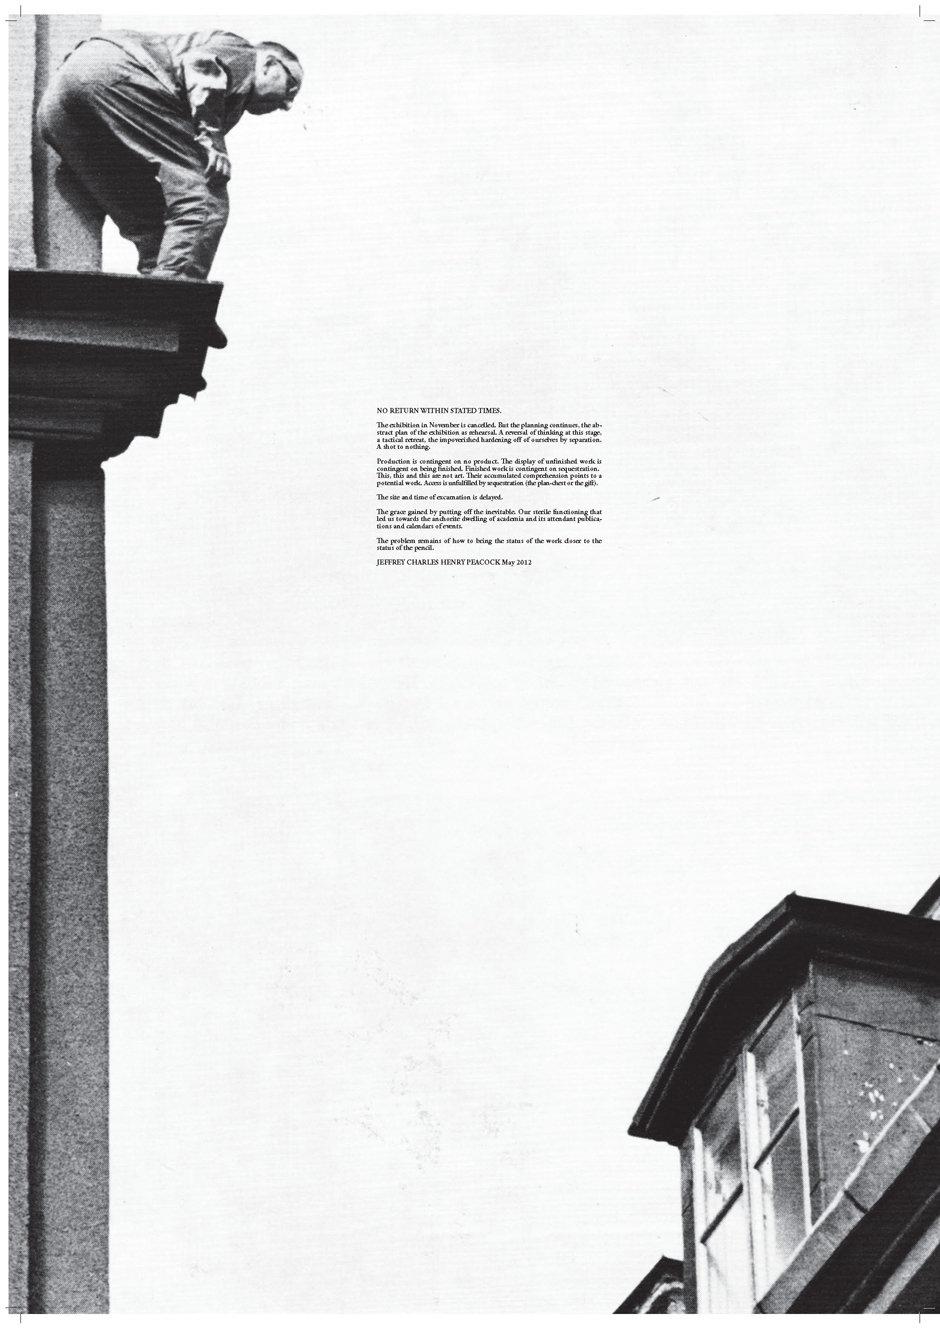 May-poster_Page_1.jpg